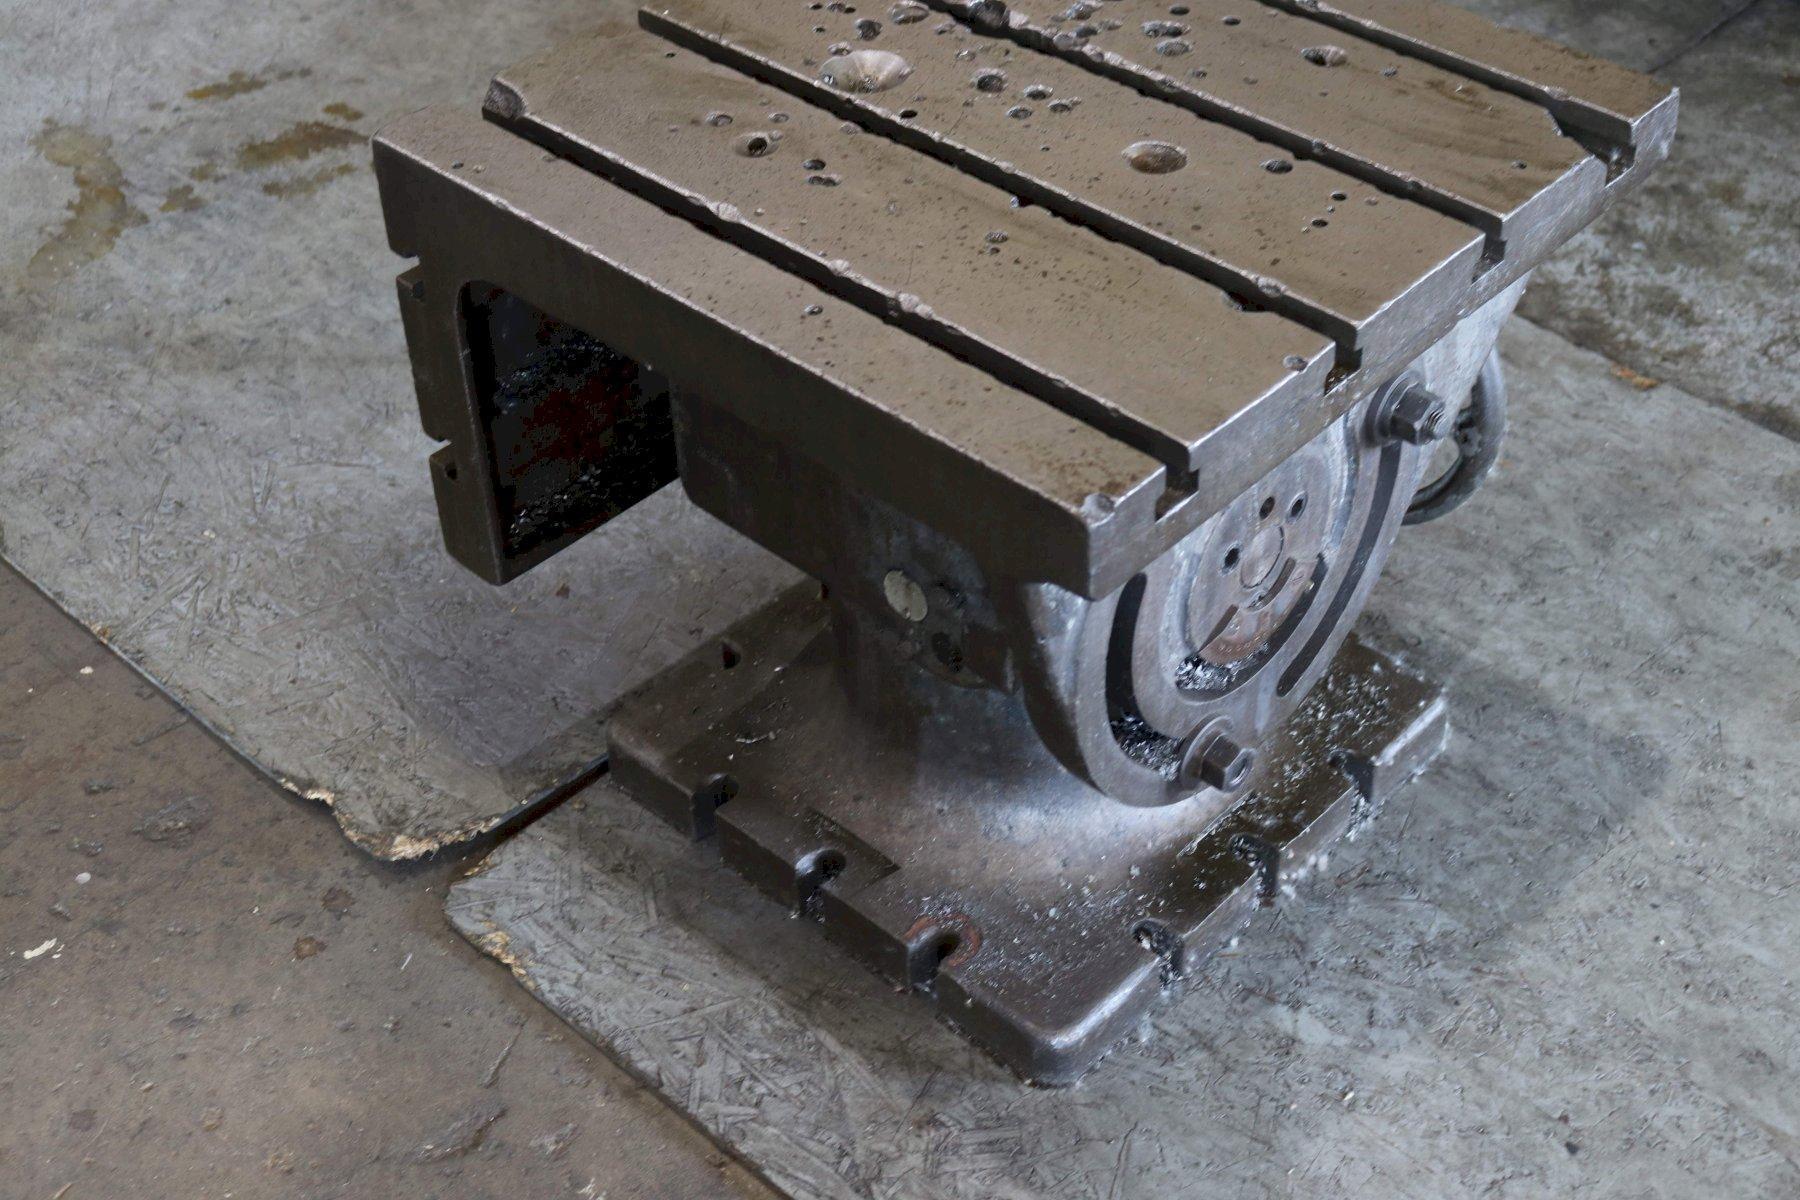 24' X 24' X 23' UNIVERSAL BOX DRILL TABLE: STOCK #73088